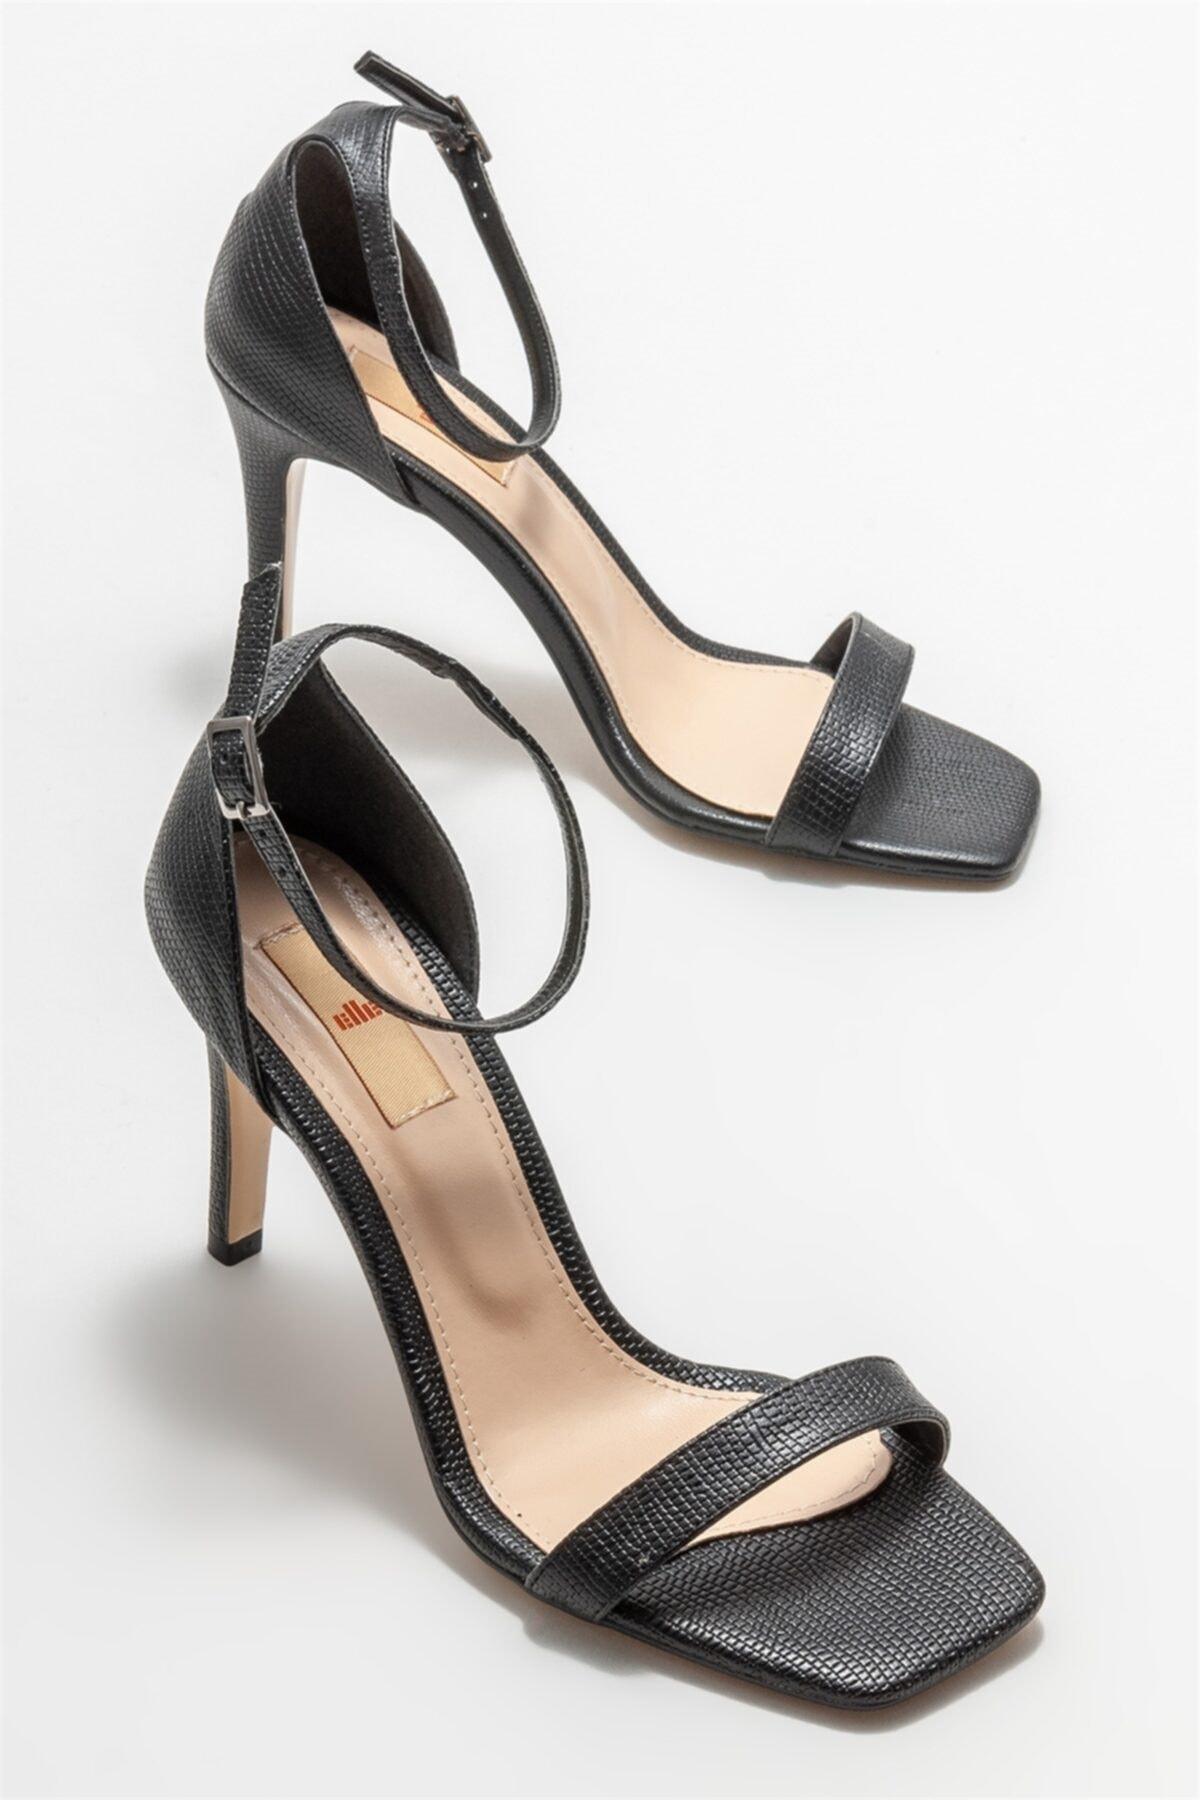 Elle Shoes Siyah Kadın Topuklu Sandalet 2